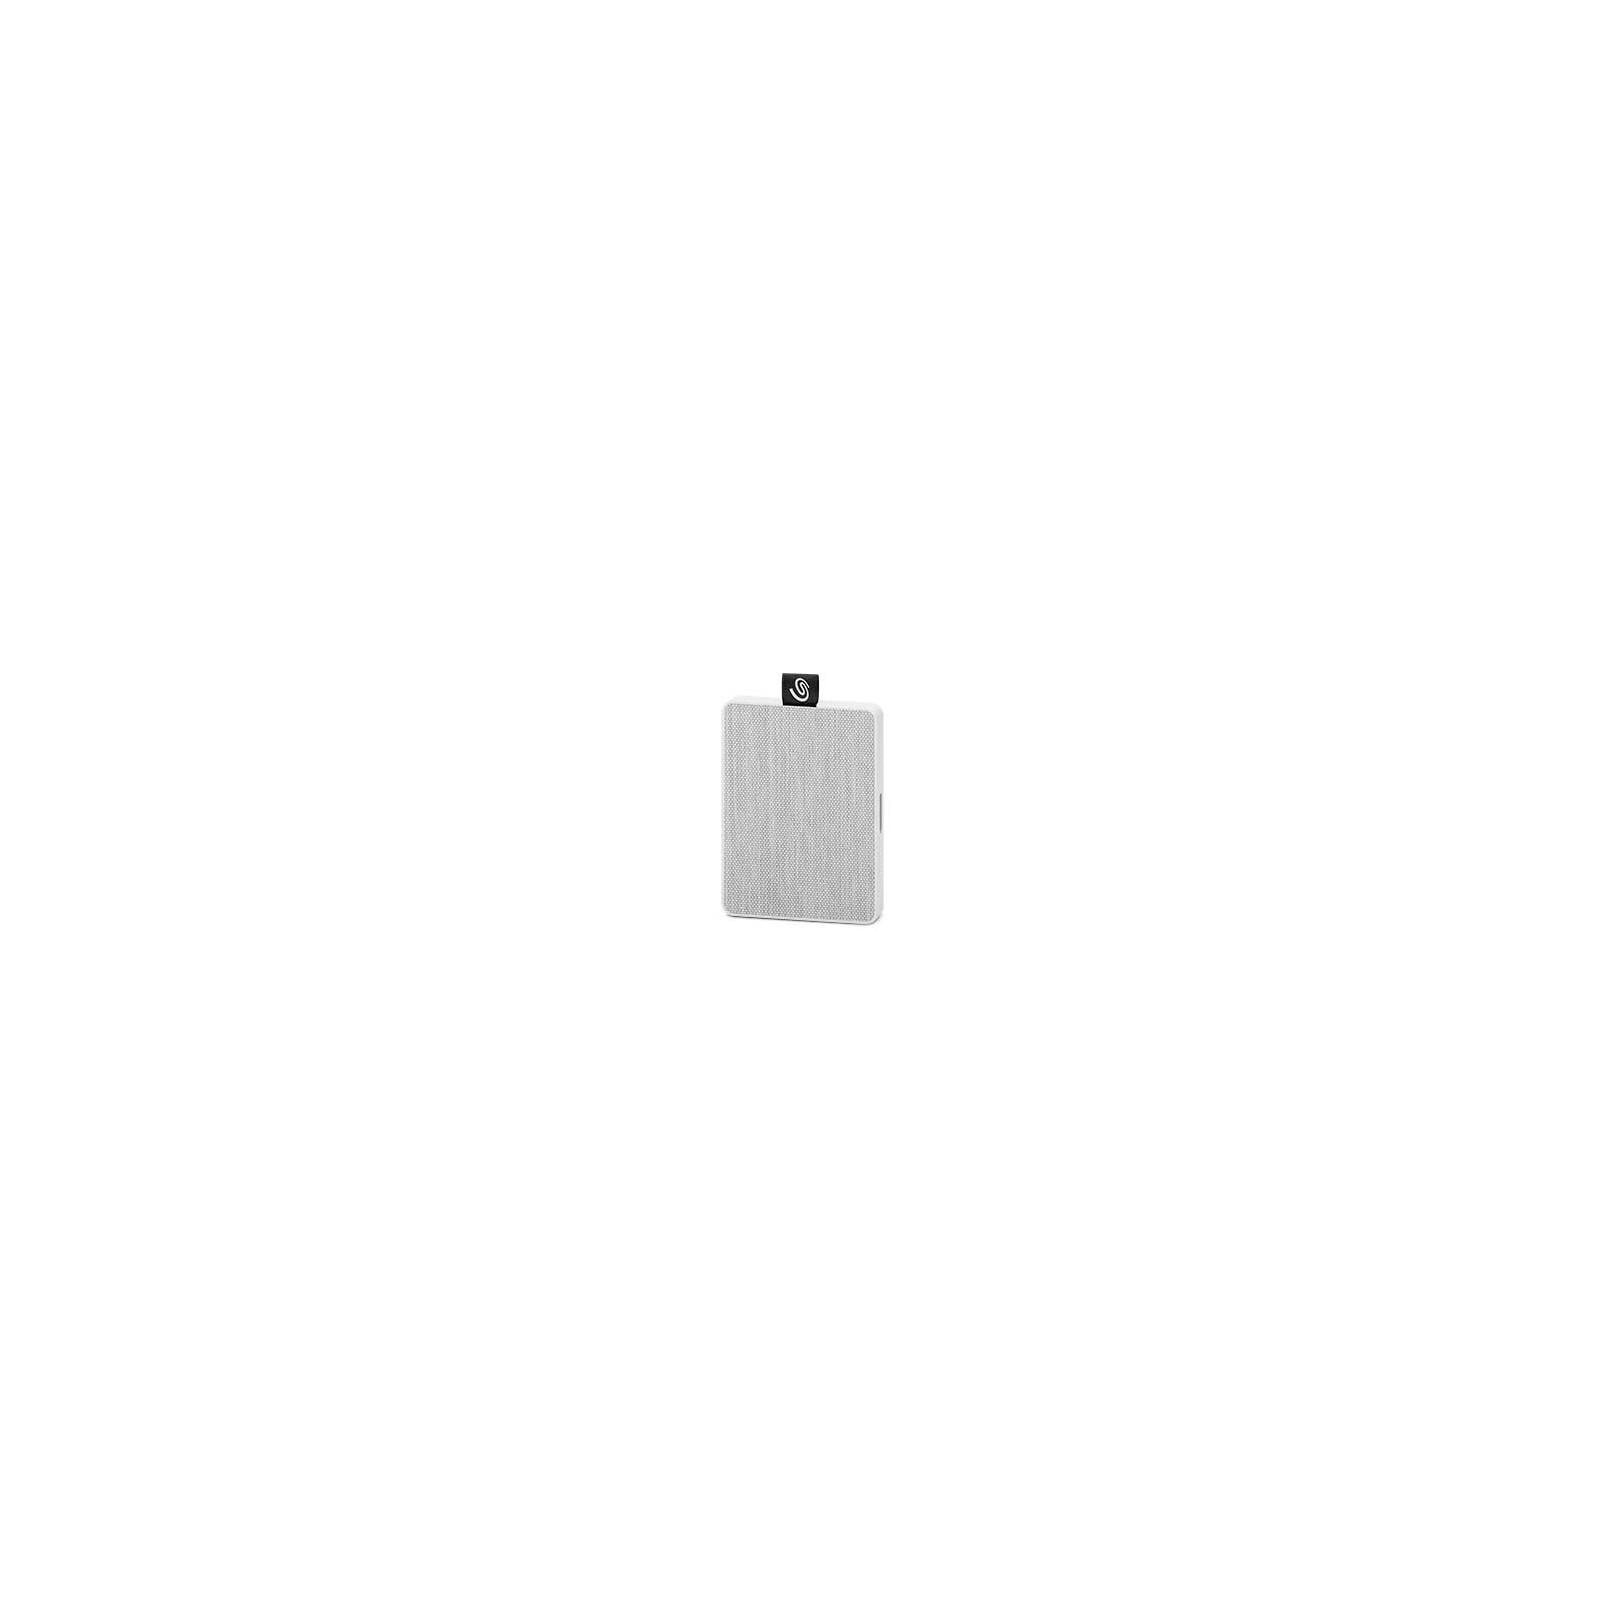 Seagate One Touch SSD 500GB extern USB 3.0 weiß